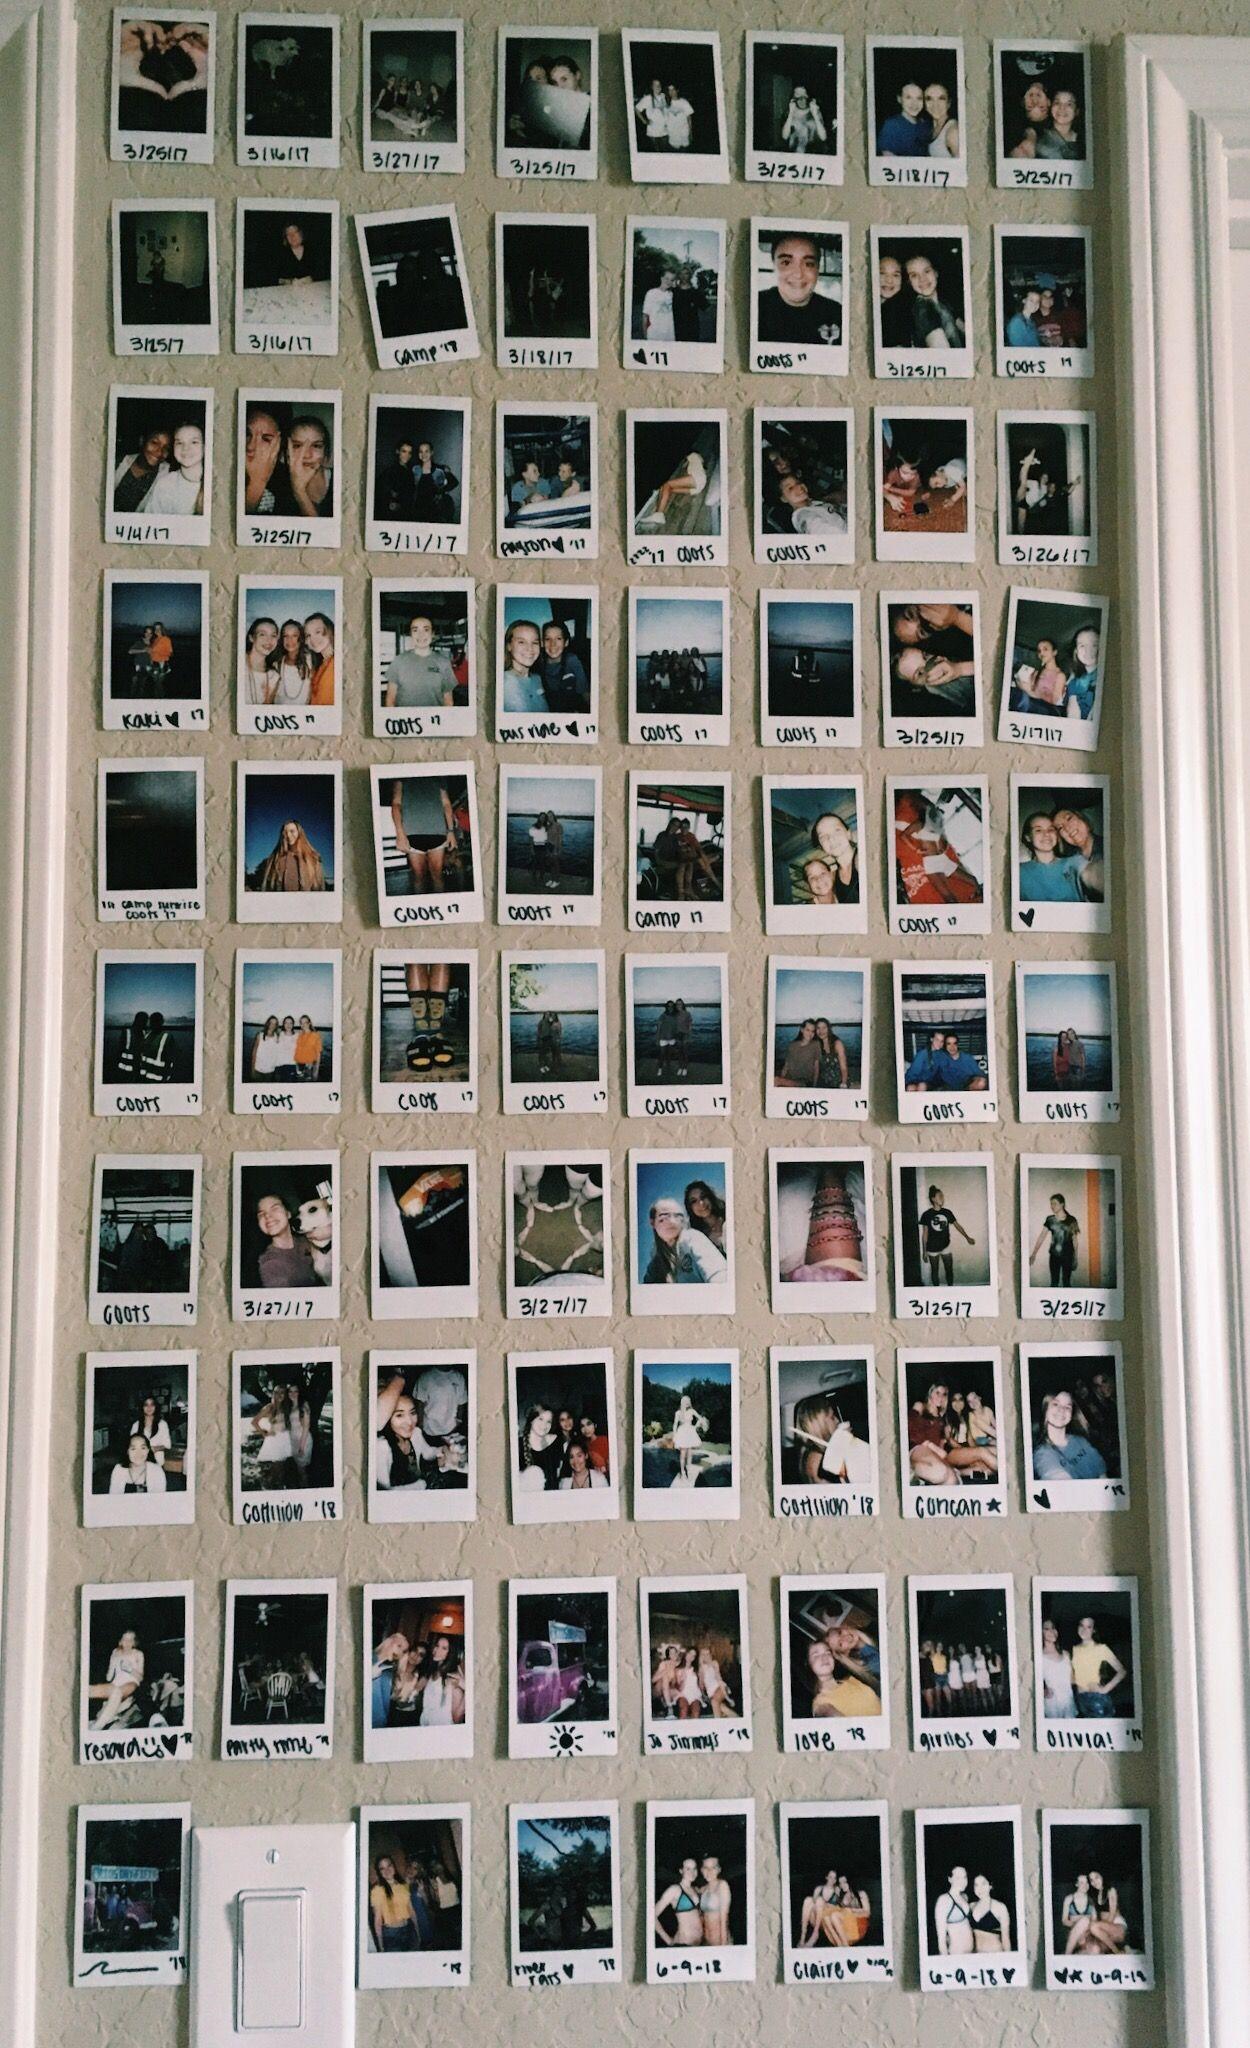 Pin By Mjb 03 On Room Room Decor Tumblr Rooms Dorm Room